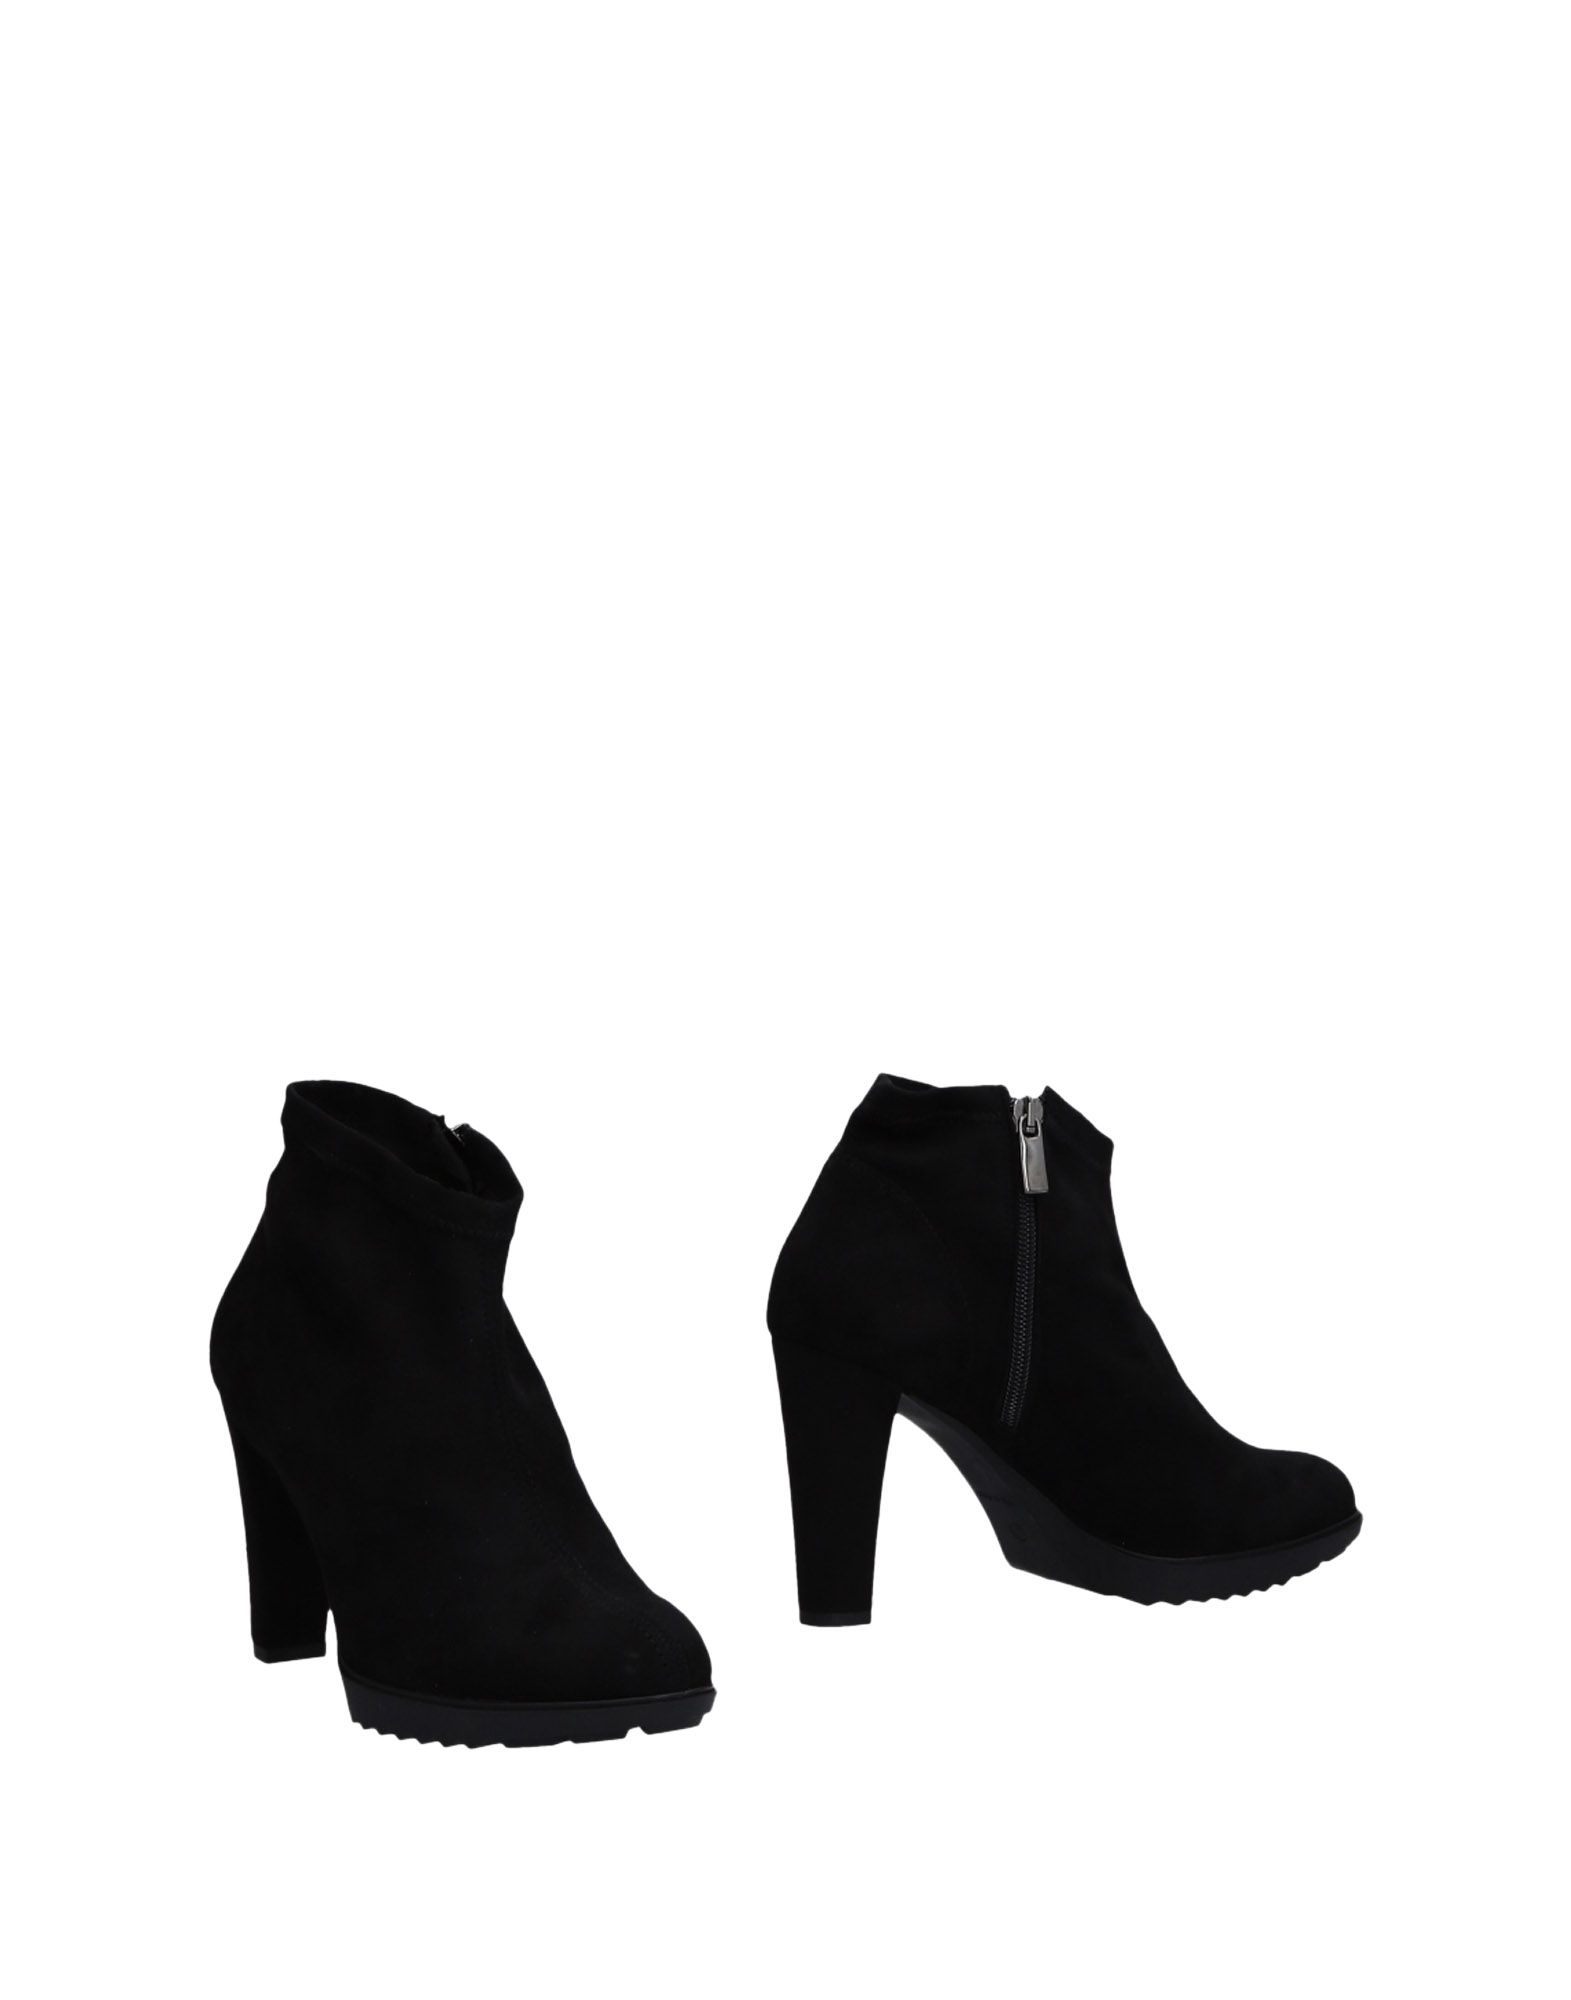 Nila & Nila Stiefelette Qualität Damen  11473231HN Gute Qualität Stiefelette beliebte Schuhe d29082